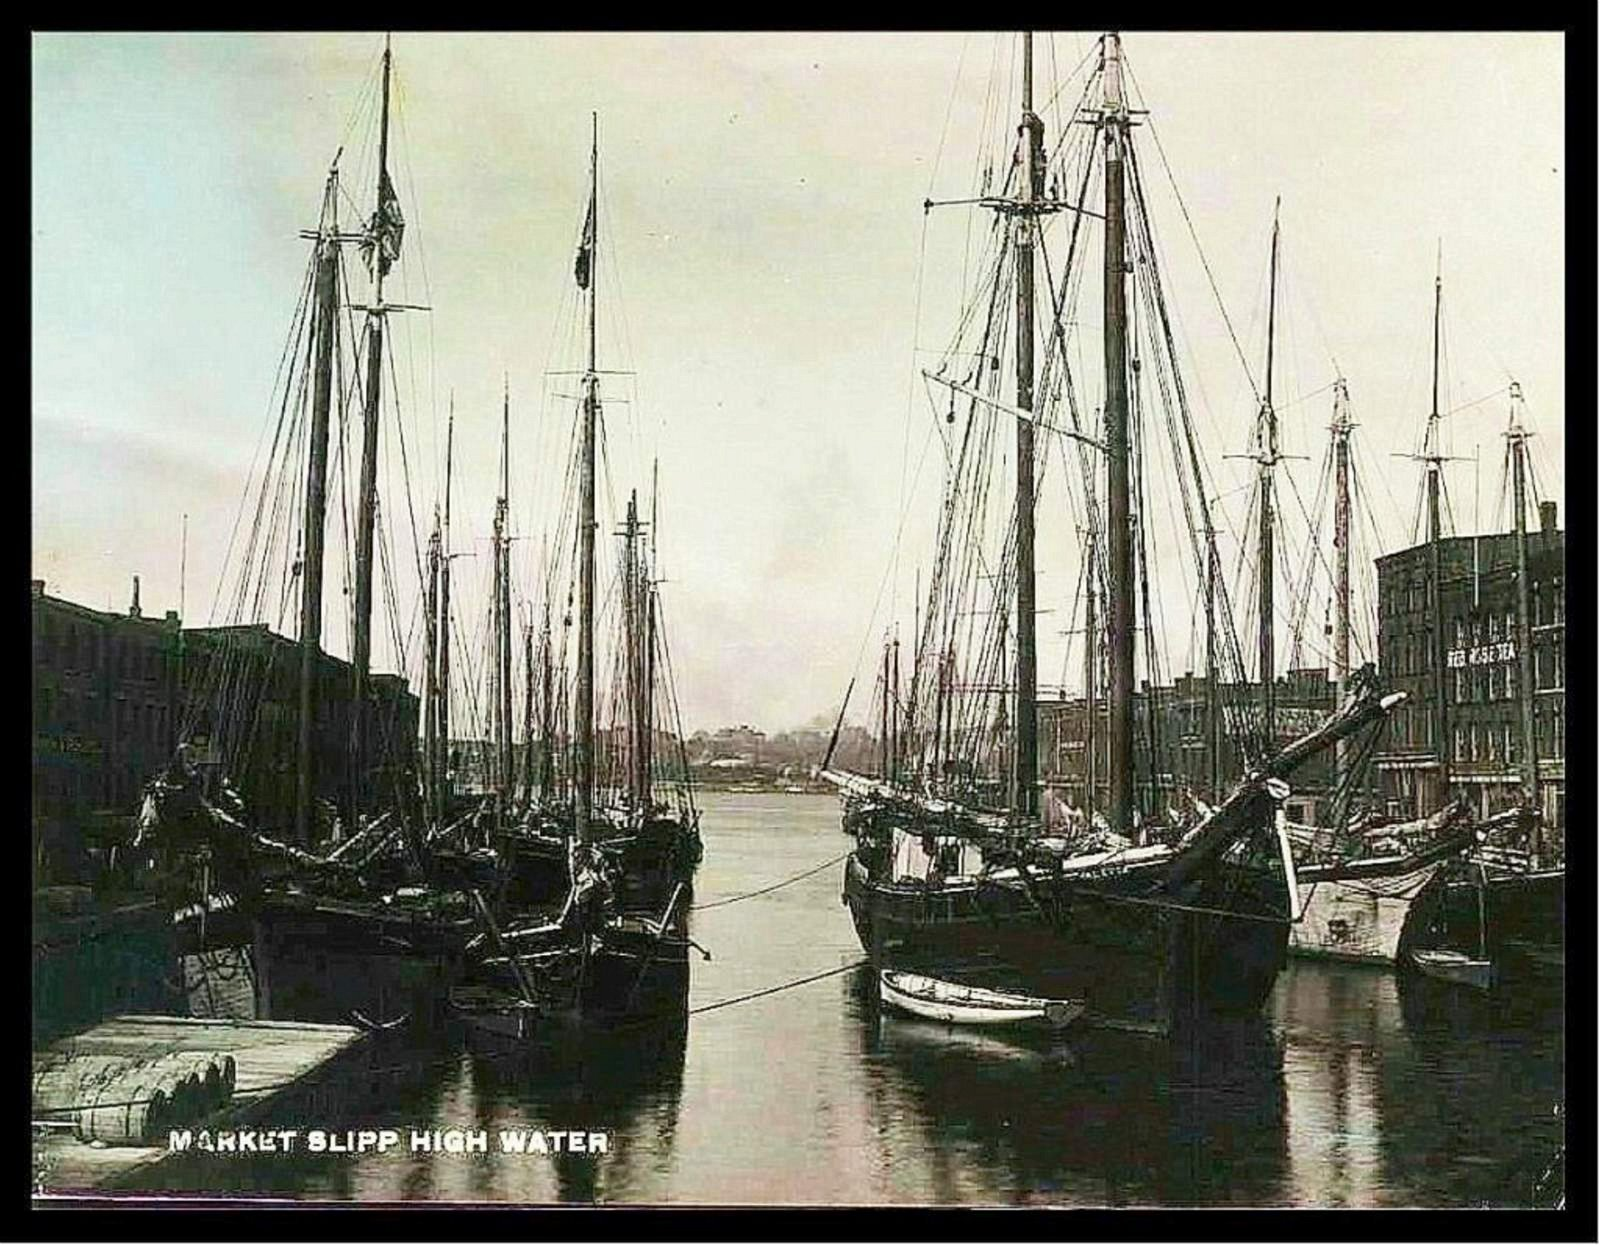 ST.JOHN NB. MARKET SLIPP HIGH WATER